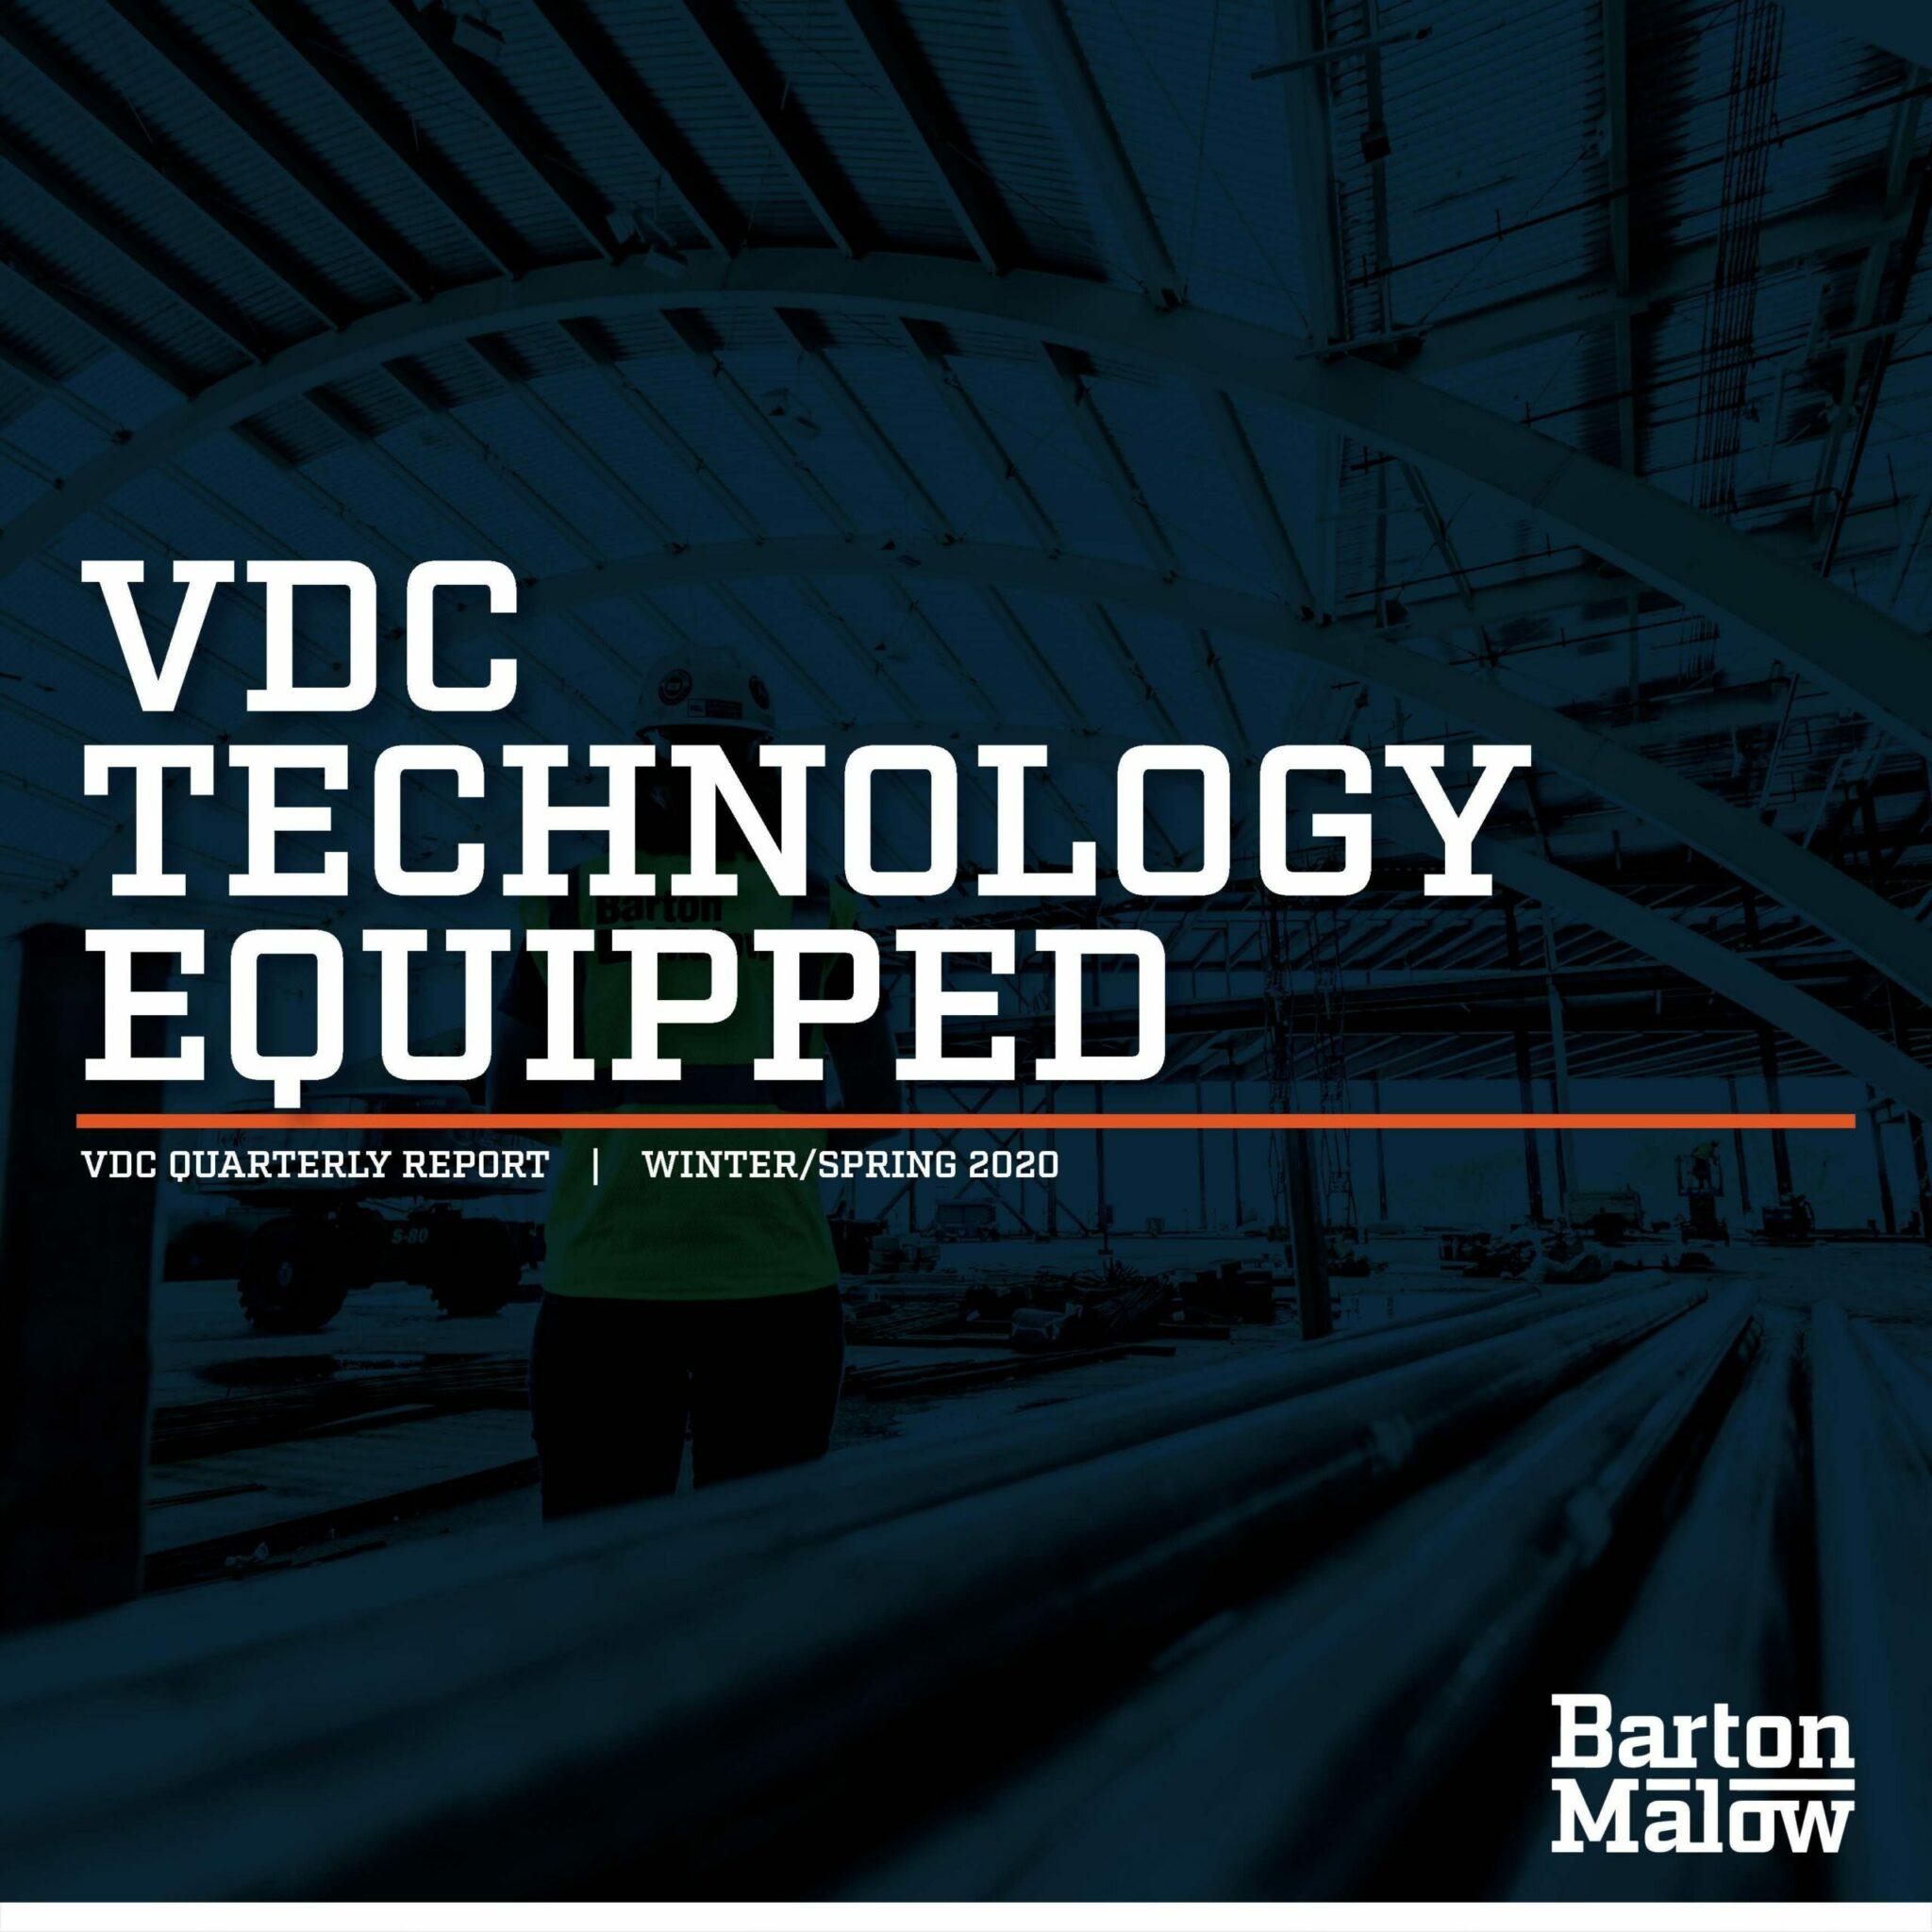 Barton Malow - VDC Quarterly Report Spring 2020